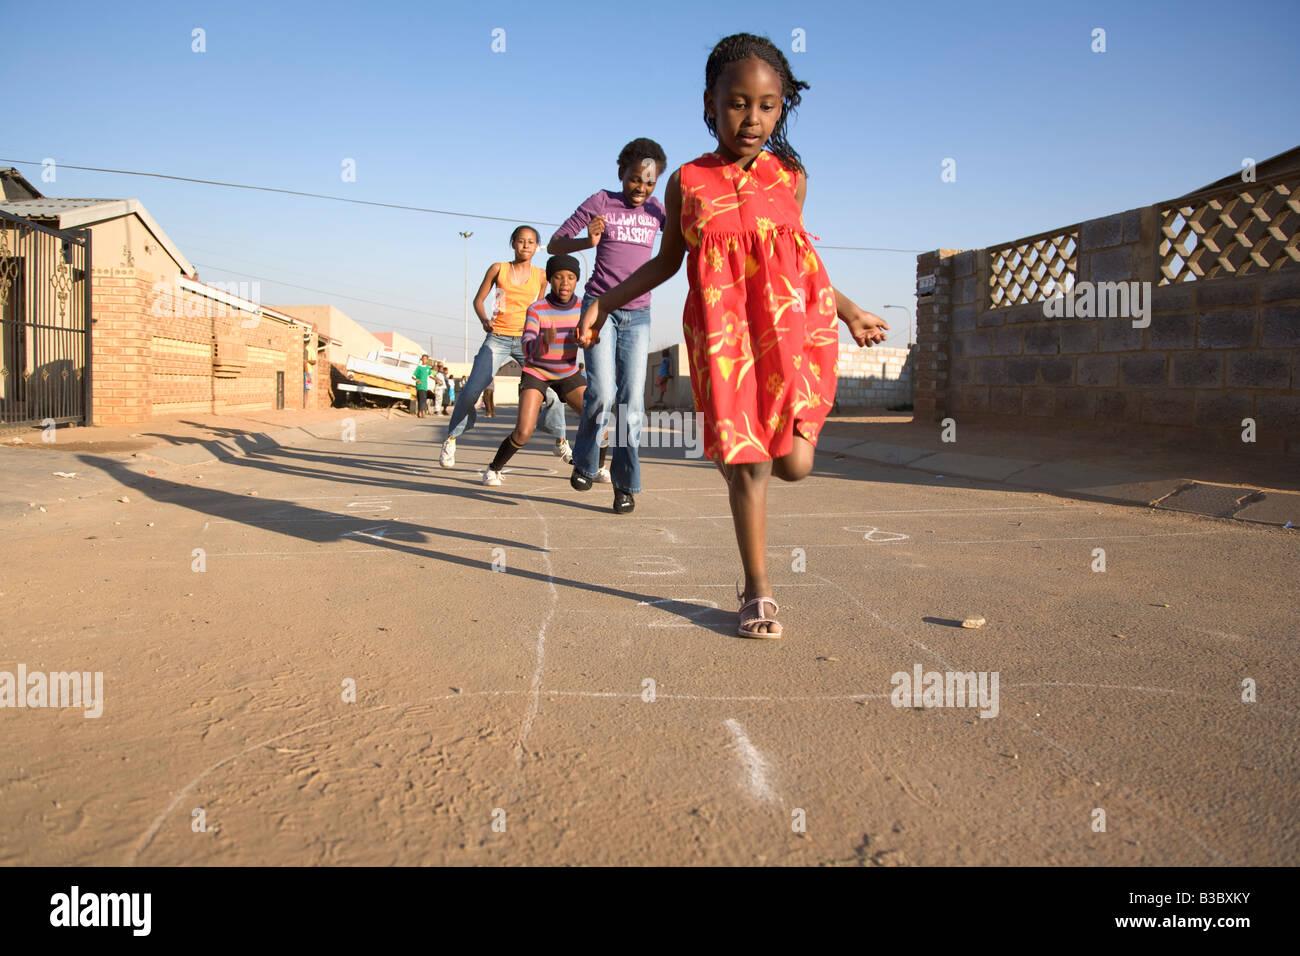 Girls playing hopscotch on street - Stock Image